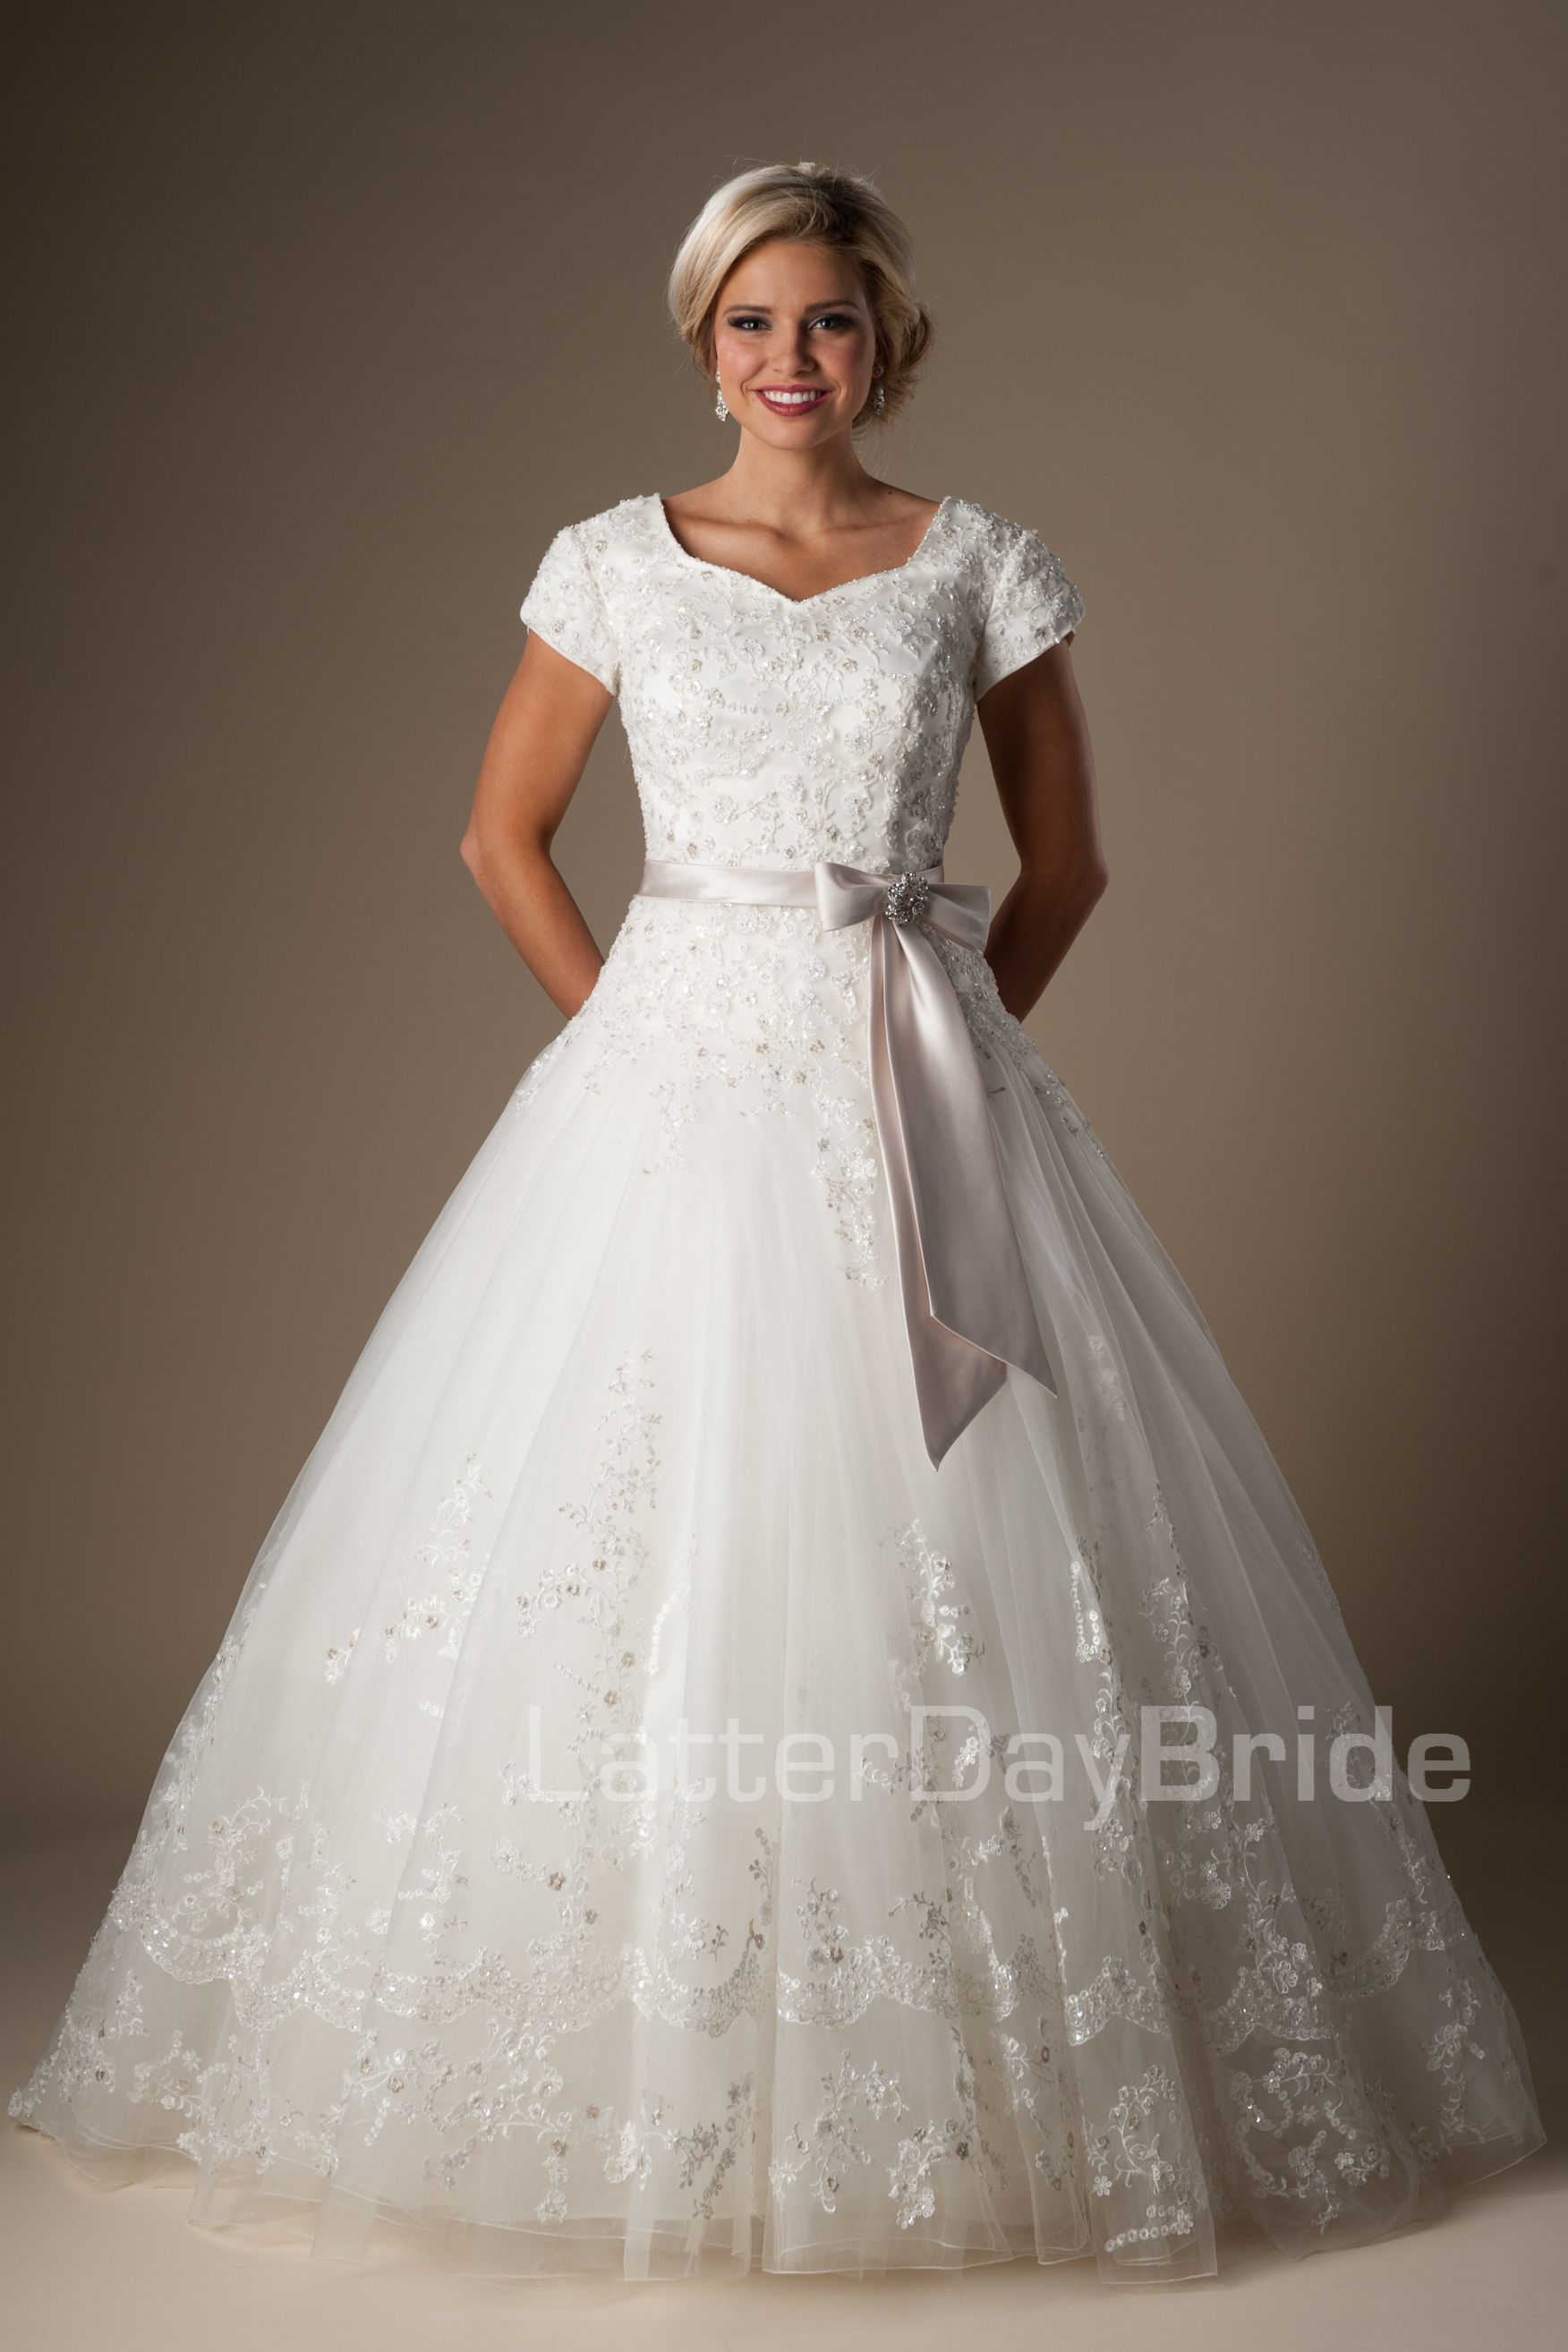 mormon wedding dresses Modest Wedding Dresses Rodolfo